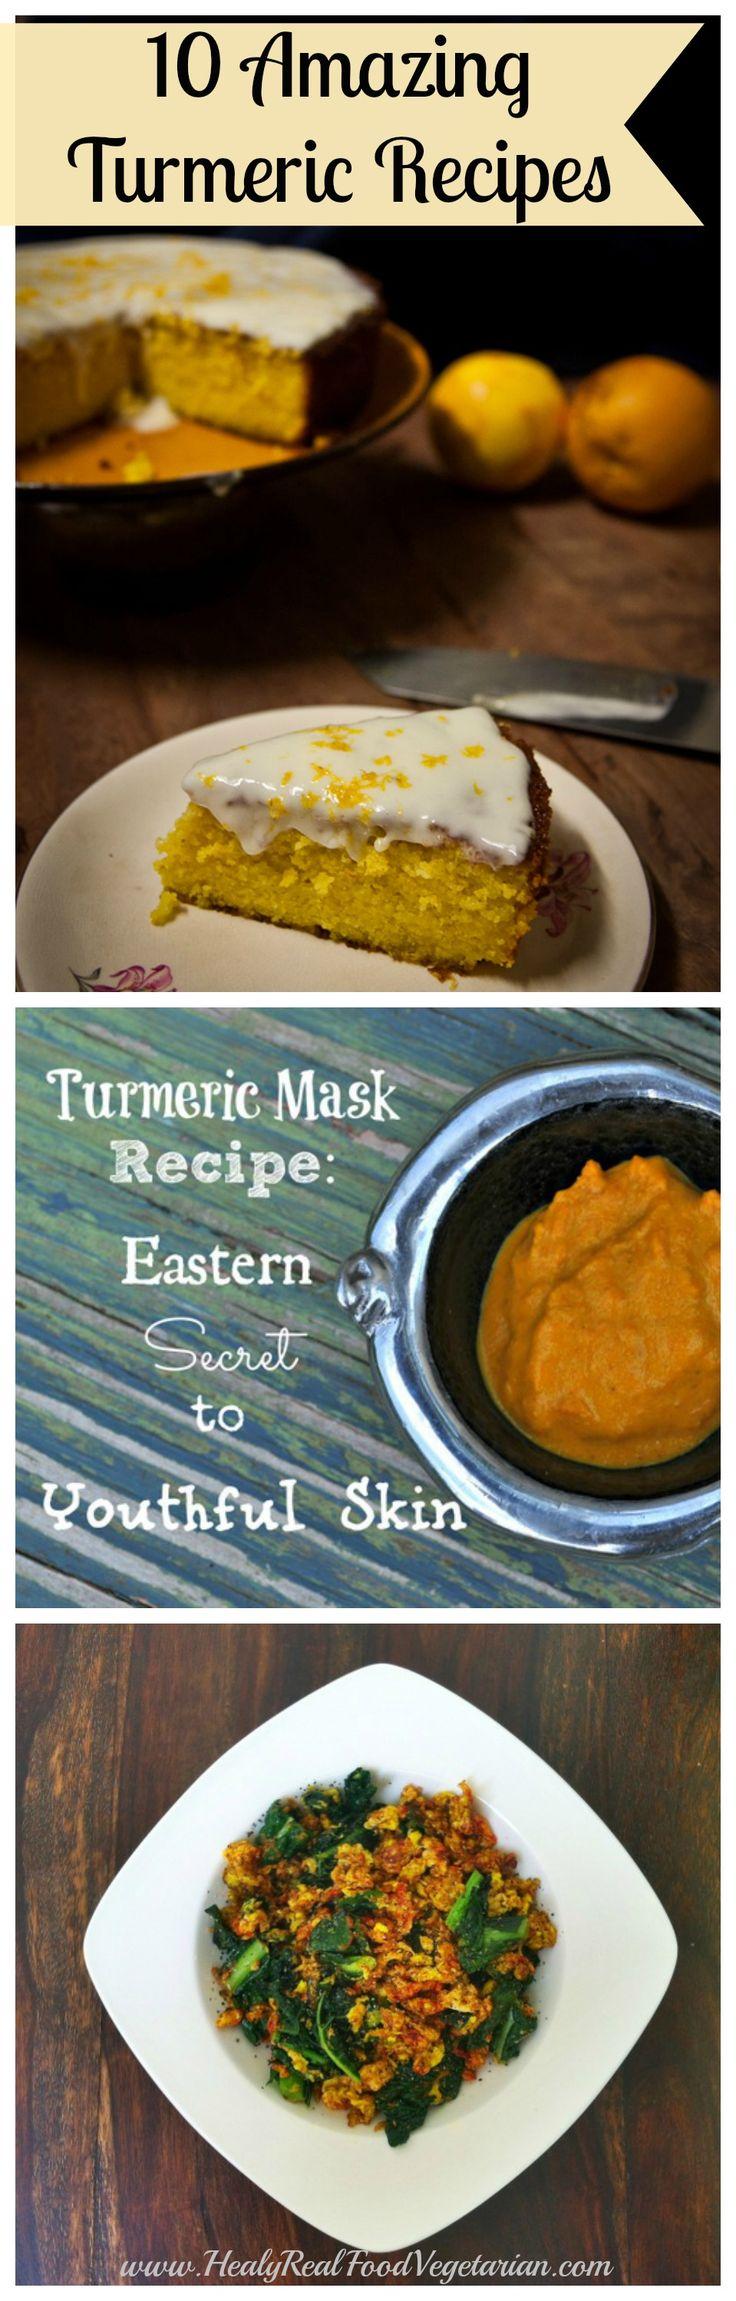 10 Amazing Turmeric Recipes @ Healy Real Food Vegetarian